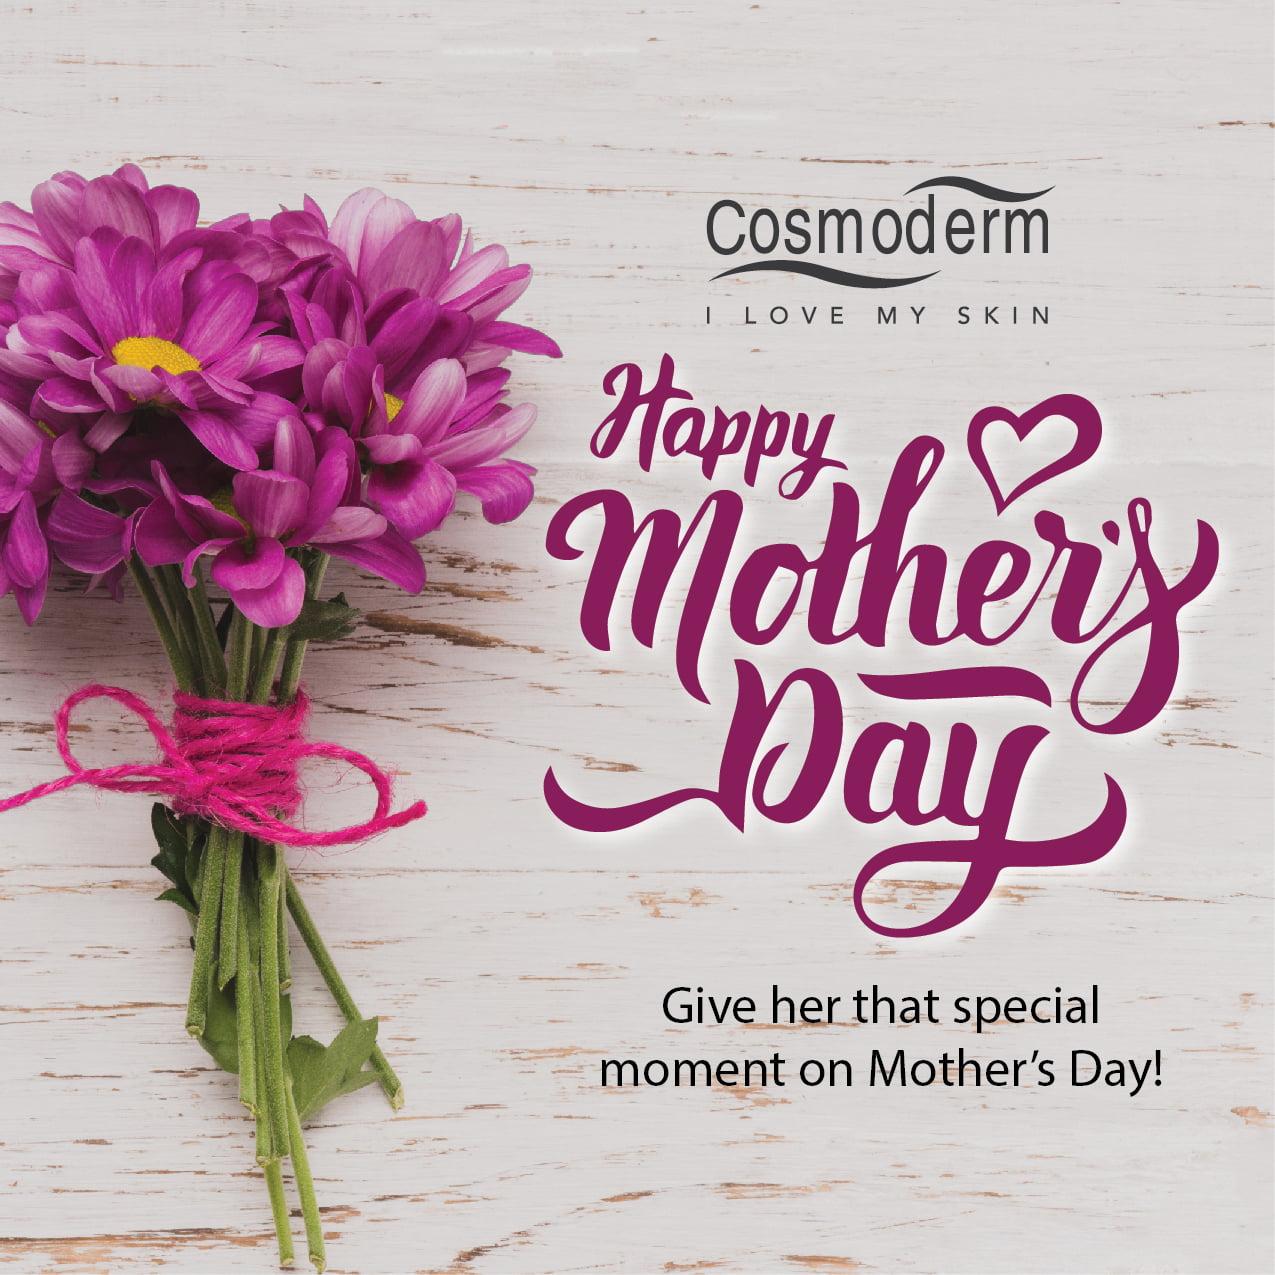 IDEA HADIAH HARI IBU : COSMODERM GIFT SET FOR MOTHER'S DAY